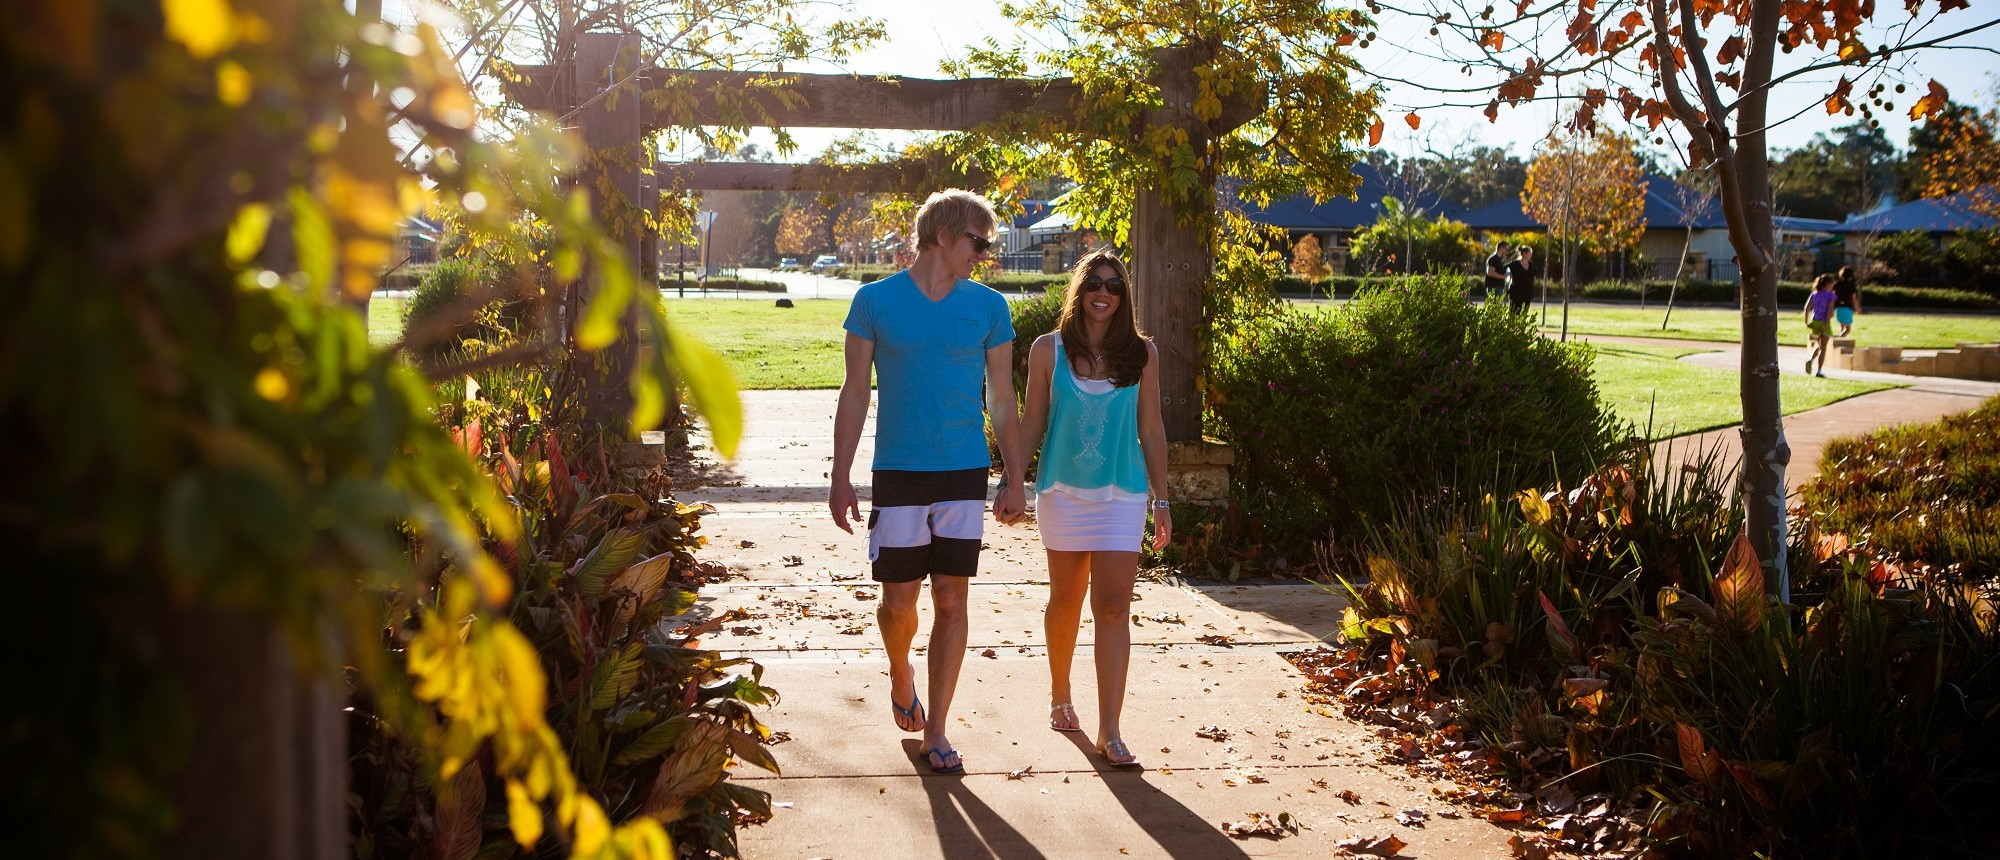 vasse-estate-land-for-sale-couple-walking-2000x860